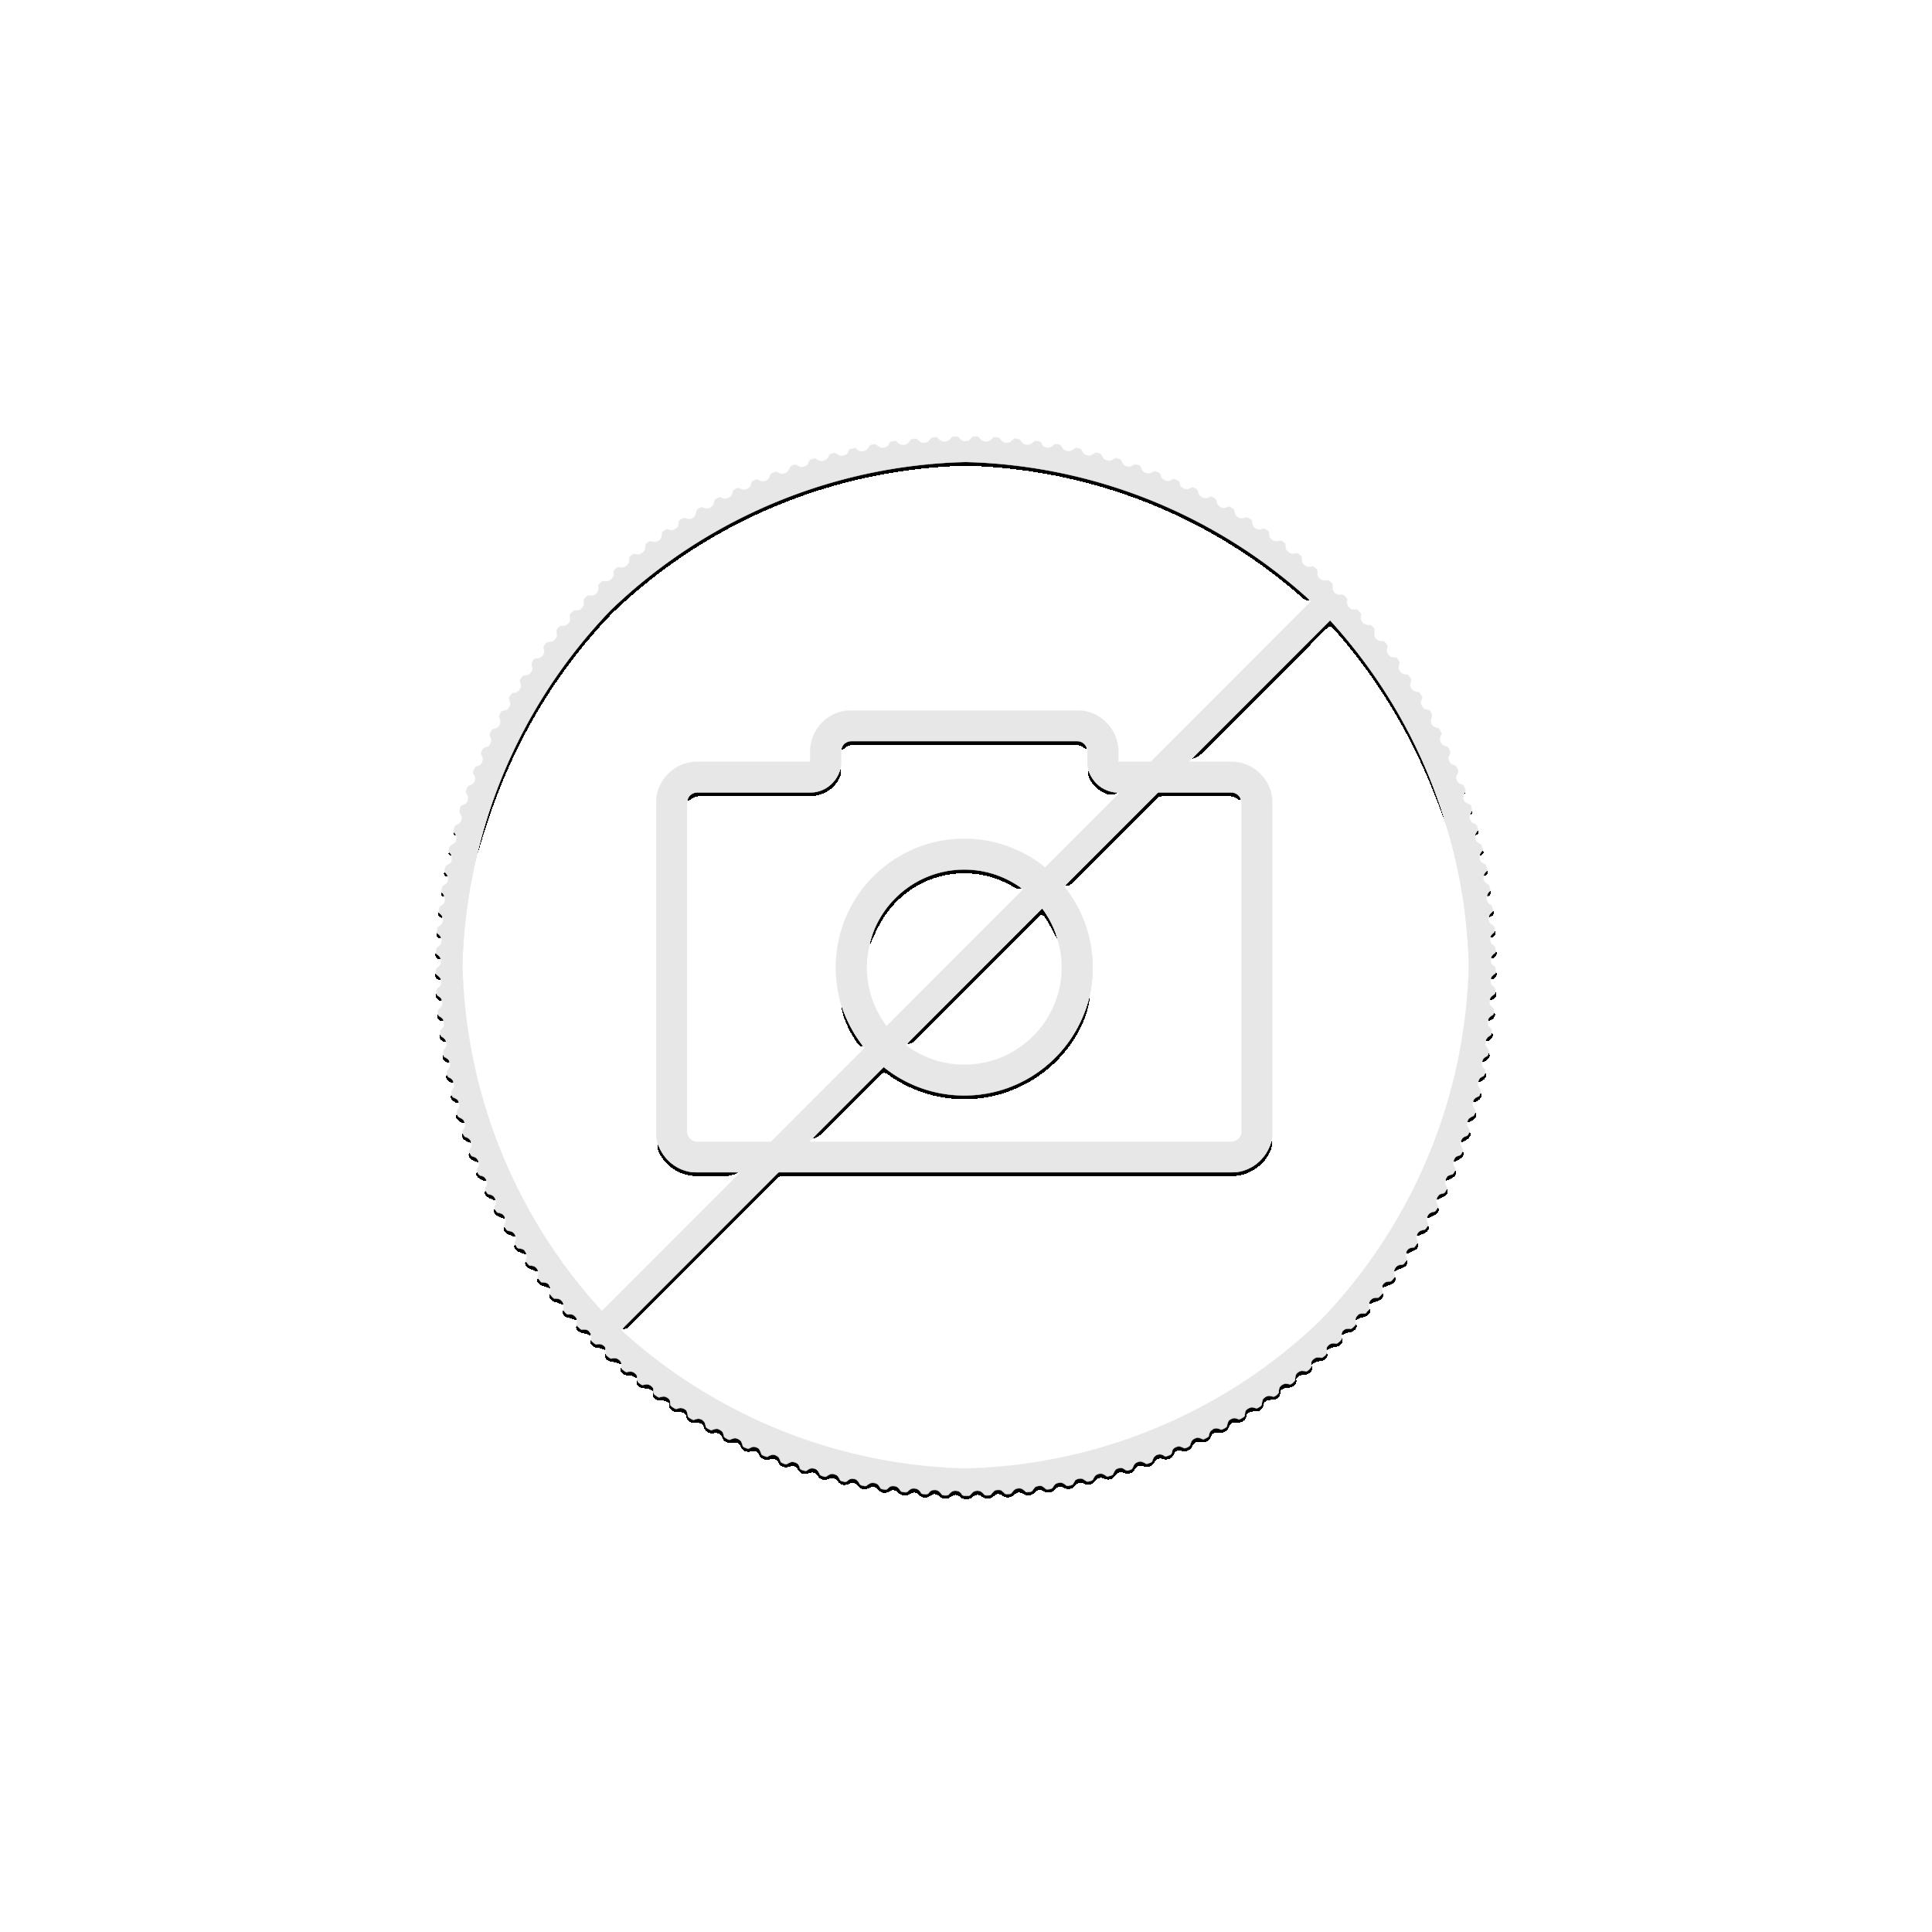 2 Troy ounce zilveren munt Mexican Libertad - diverse jaargangen